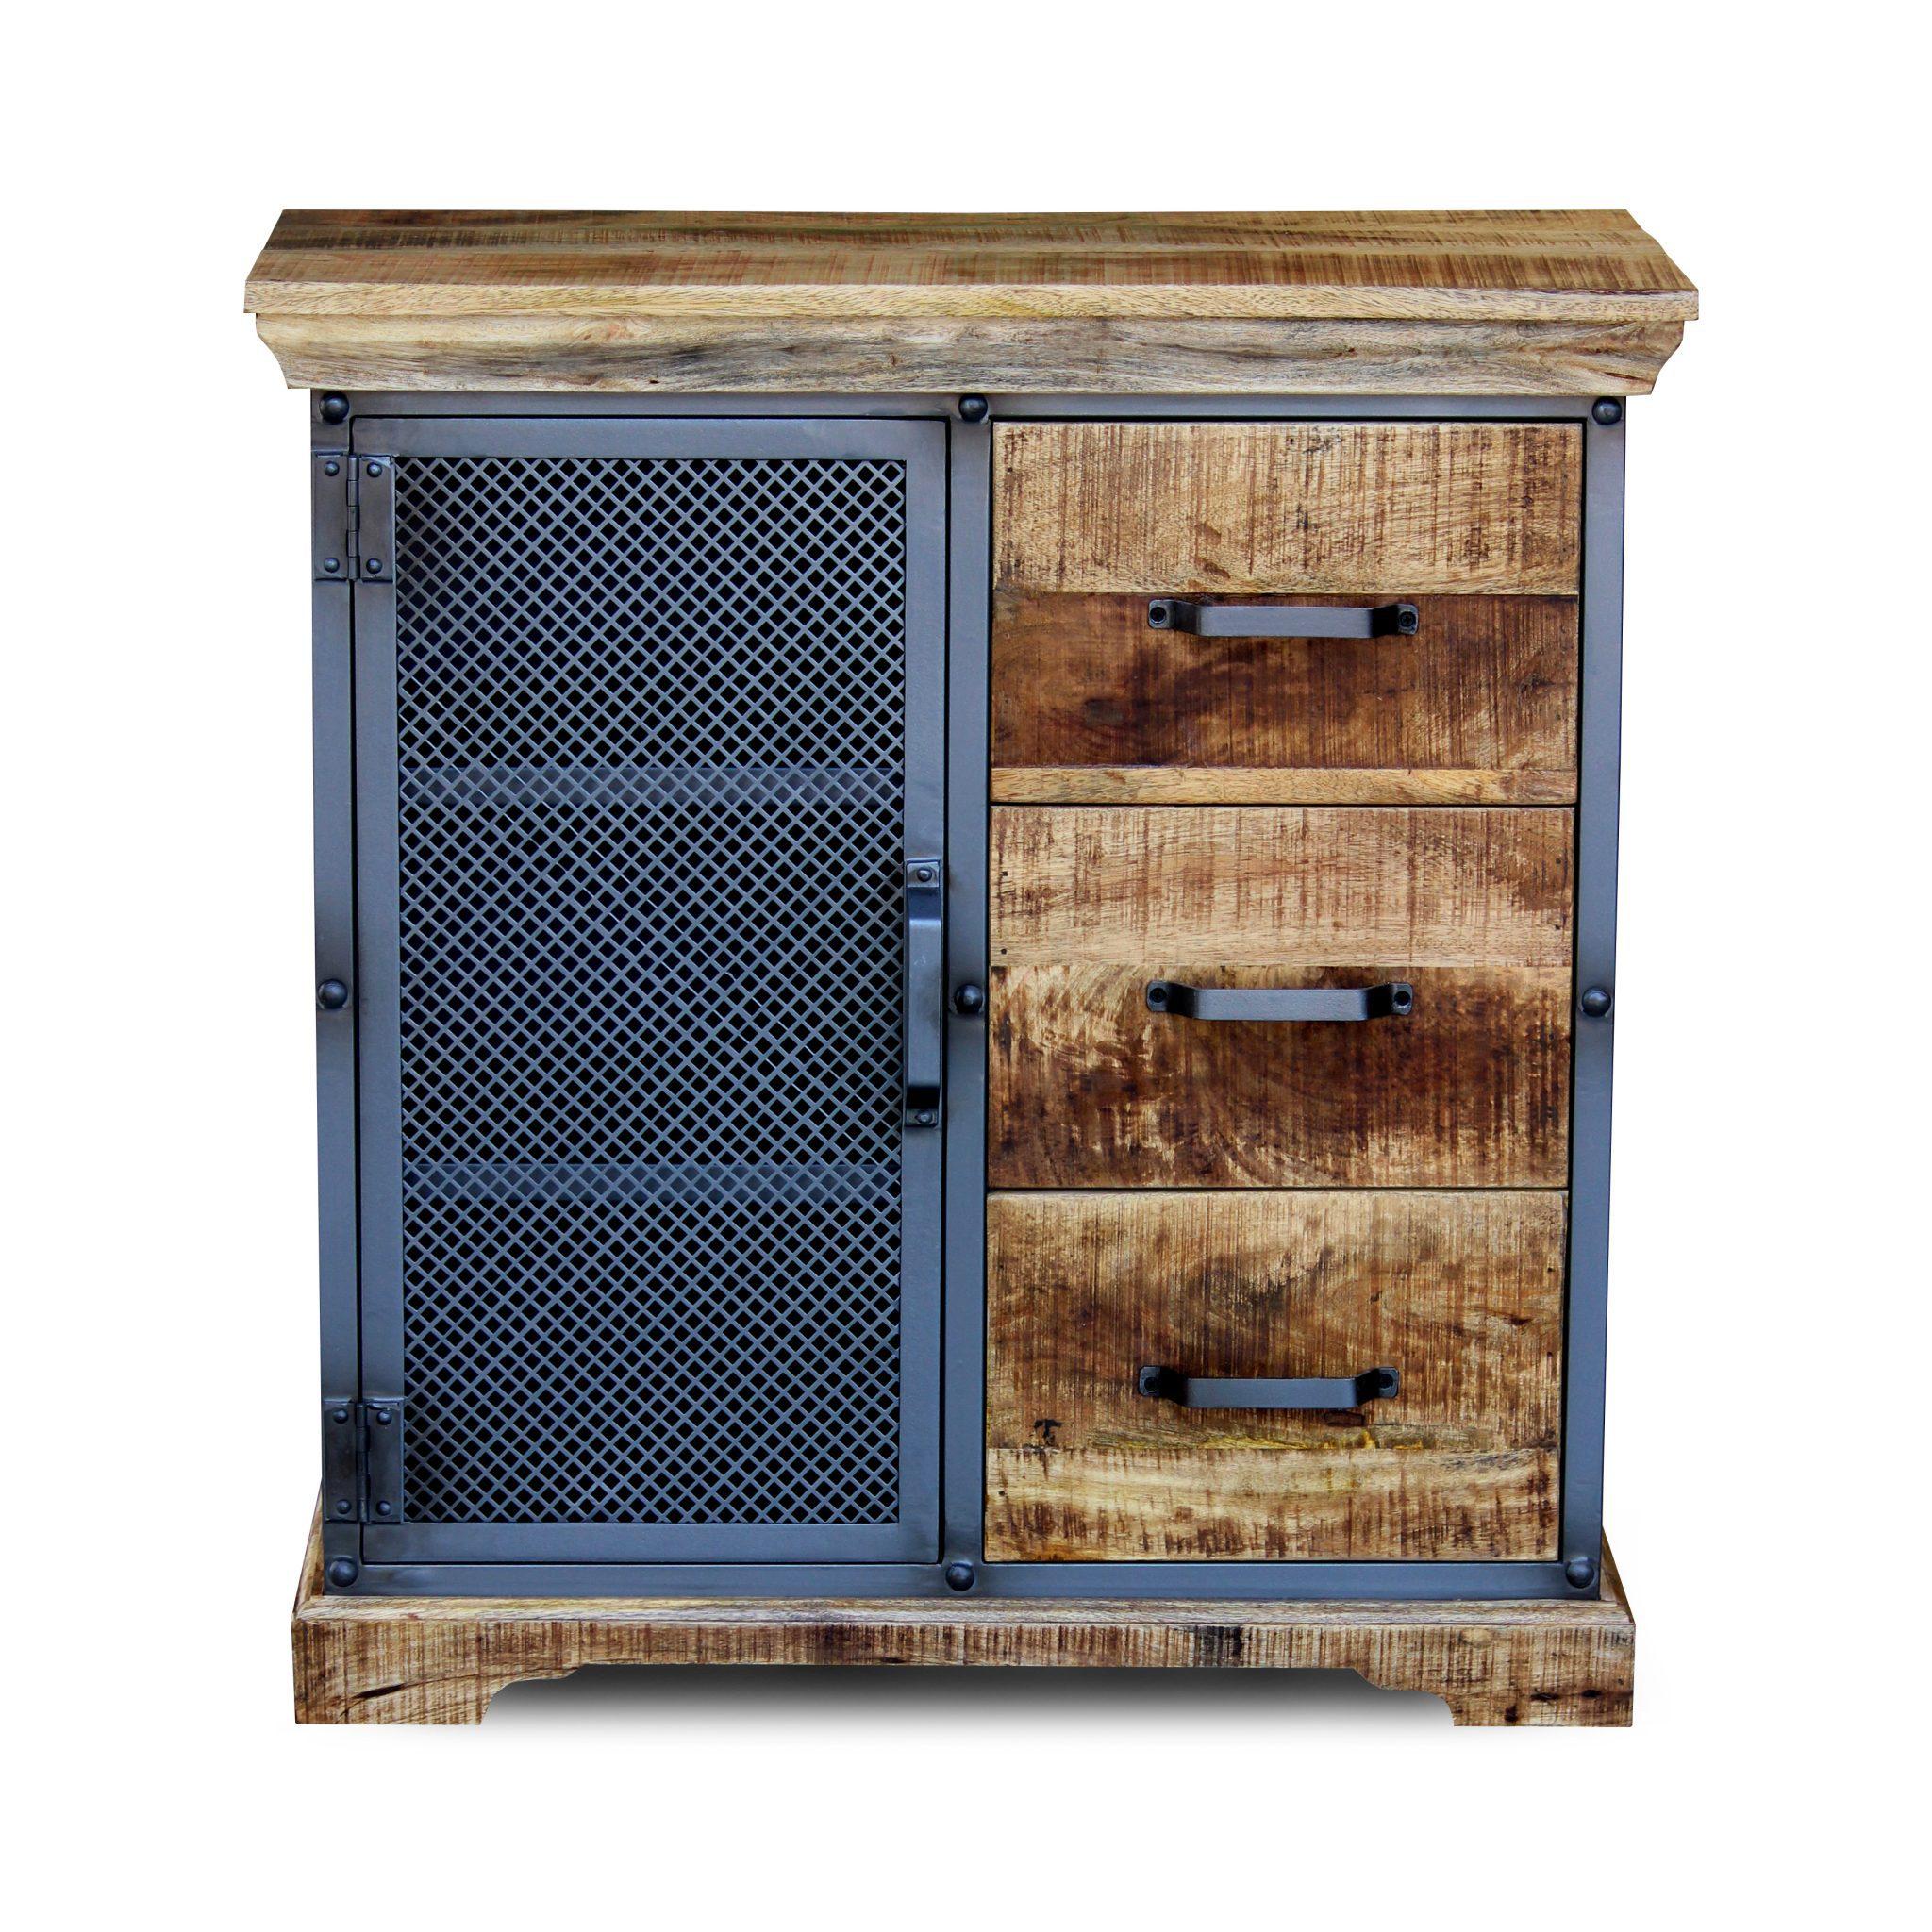 Amereli Small Sideboard Chesterfield The Ashgate Furniture Company